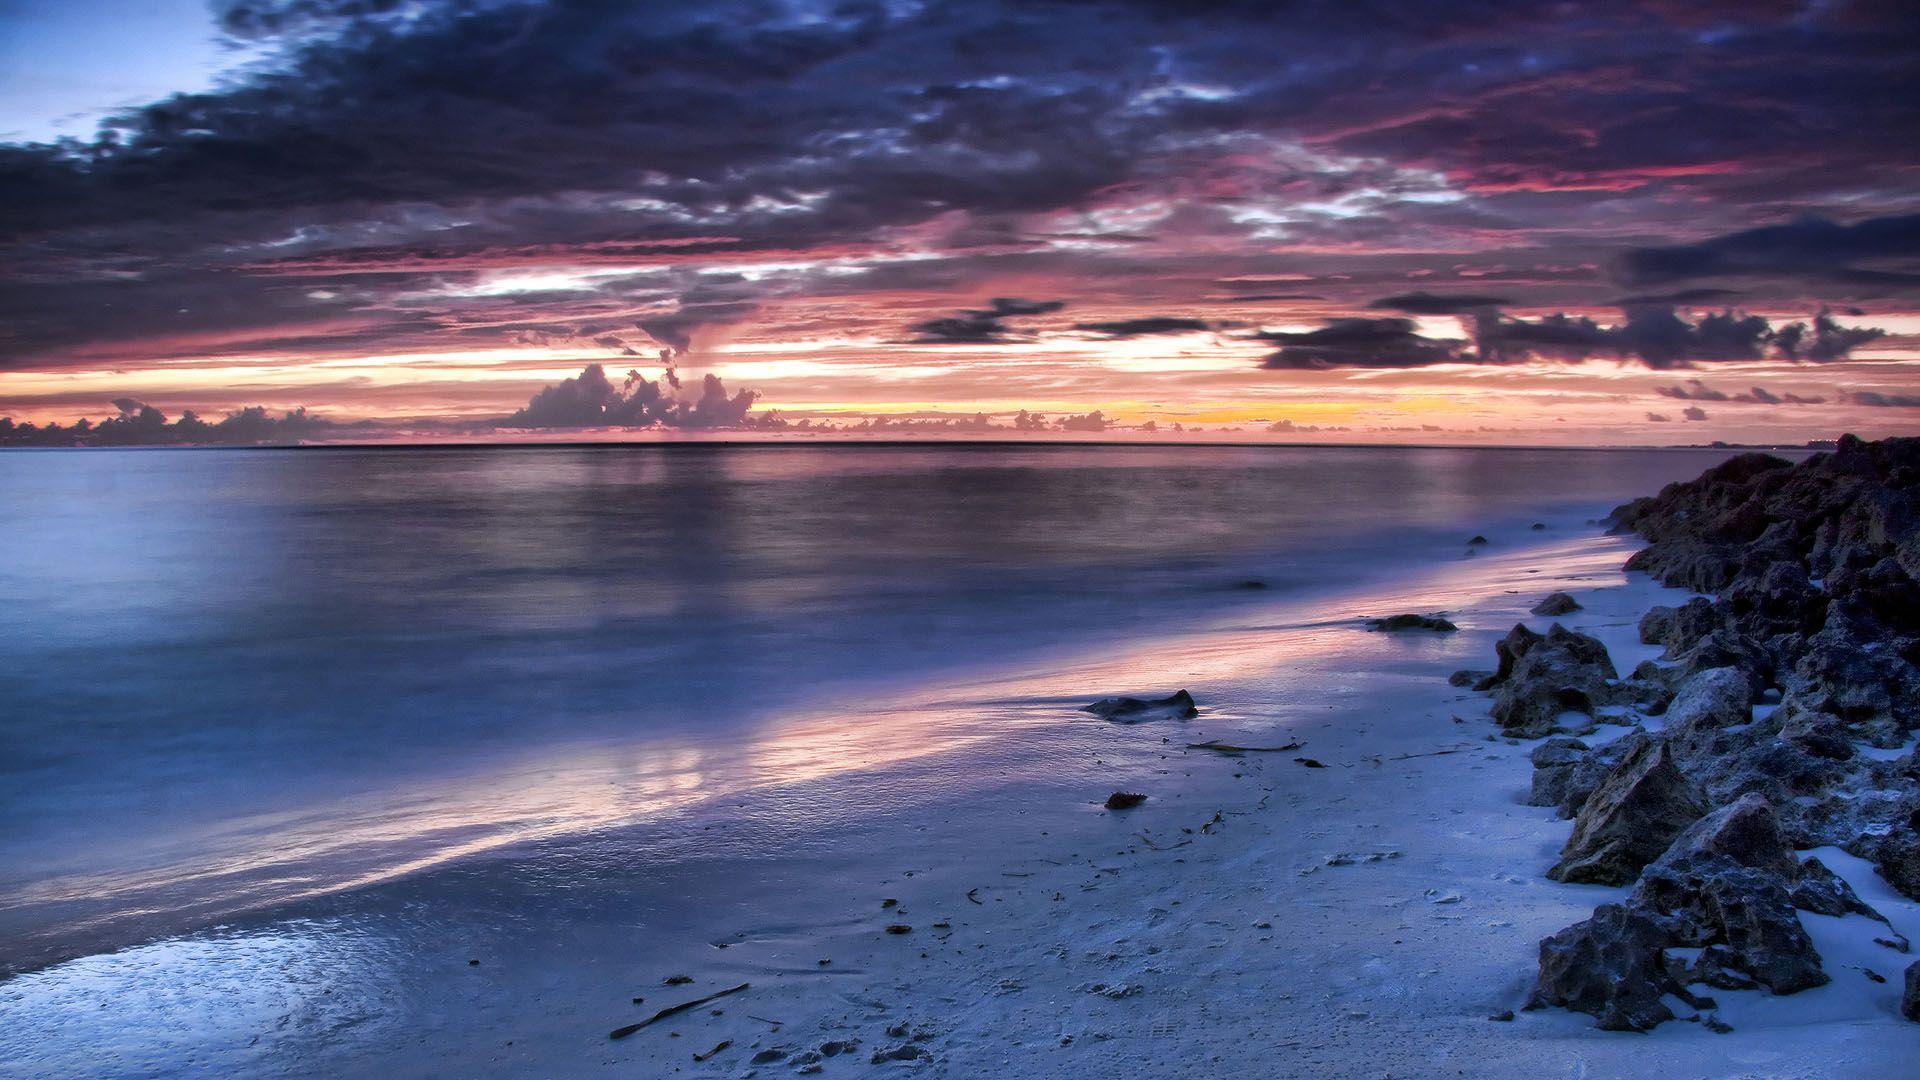 Night Time On The Beach Nature 4 Pinterest Beach Wallpaper